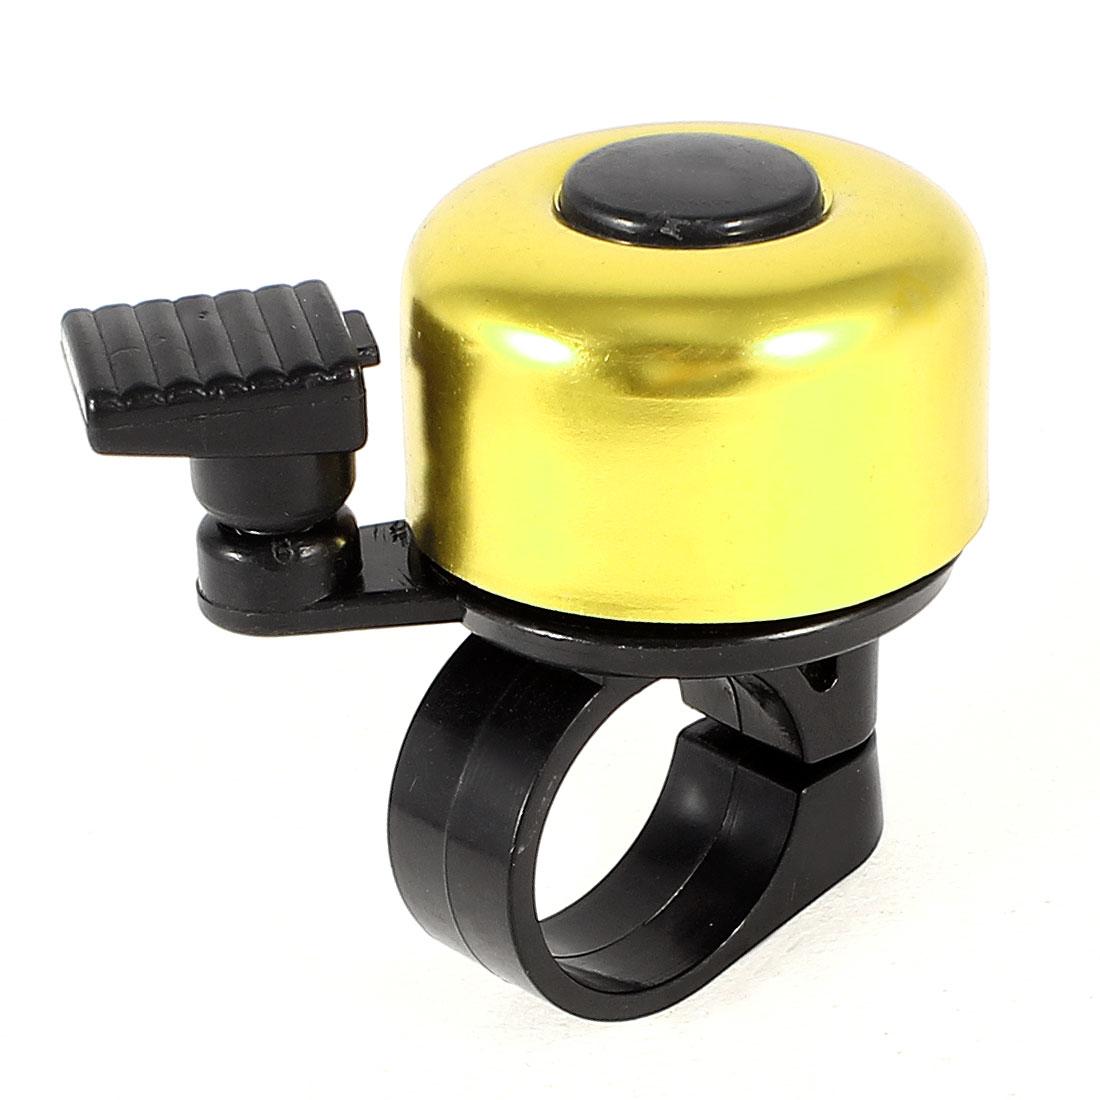 Round Housing 21mm Dia Handlebar Alarm Ring Bell Black Gold Tone